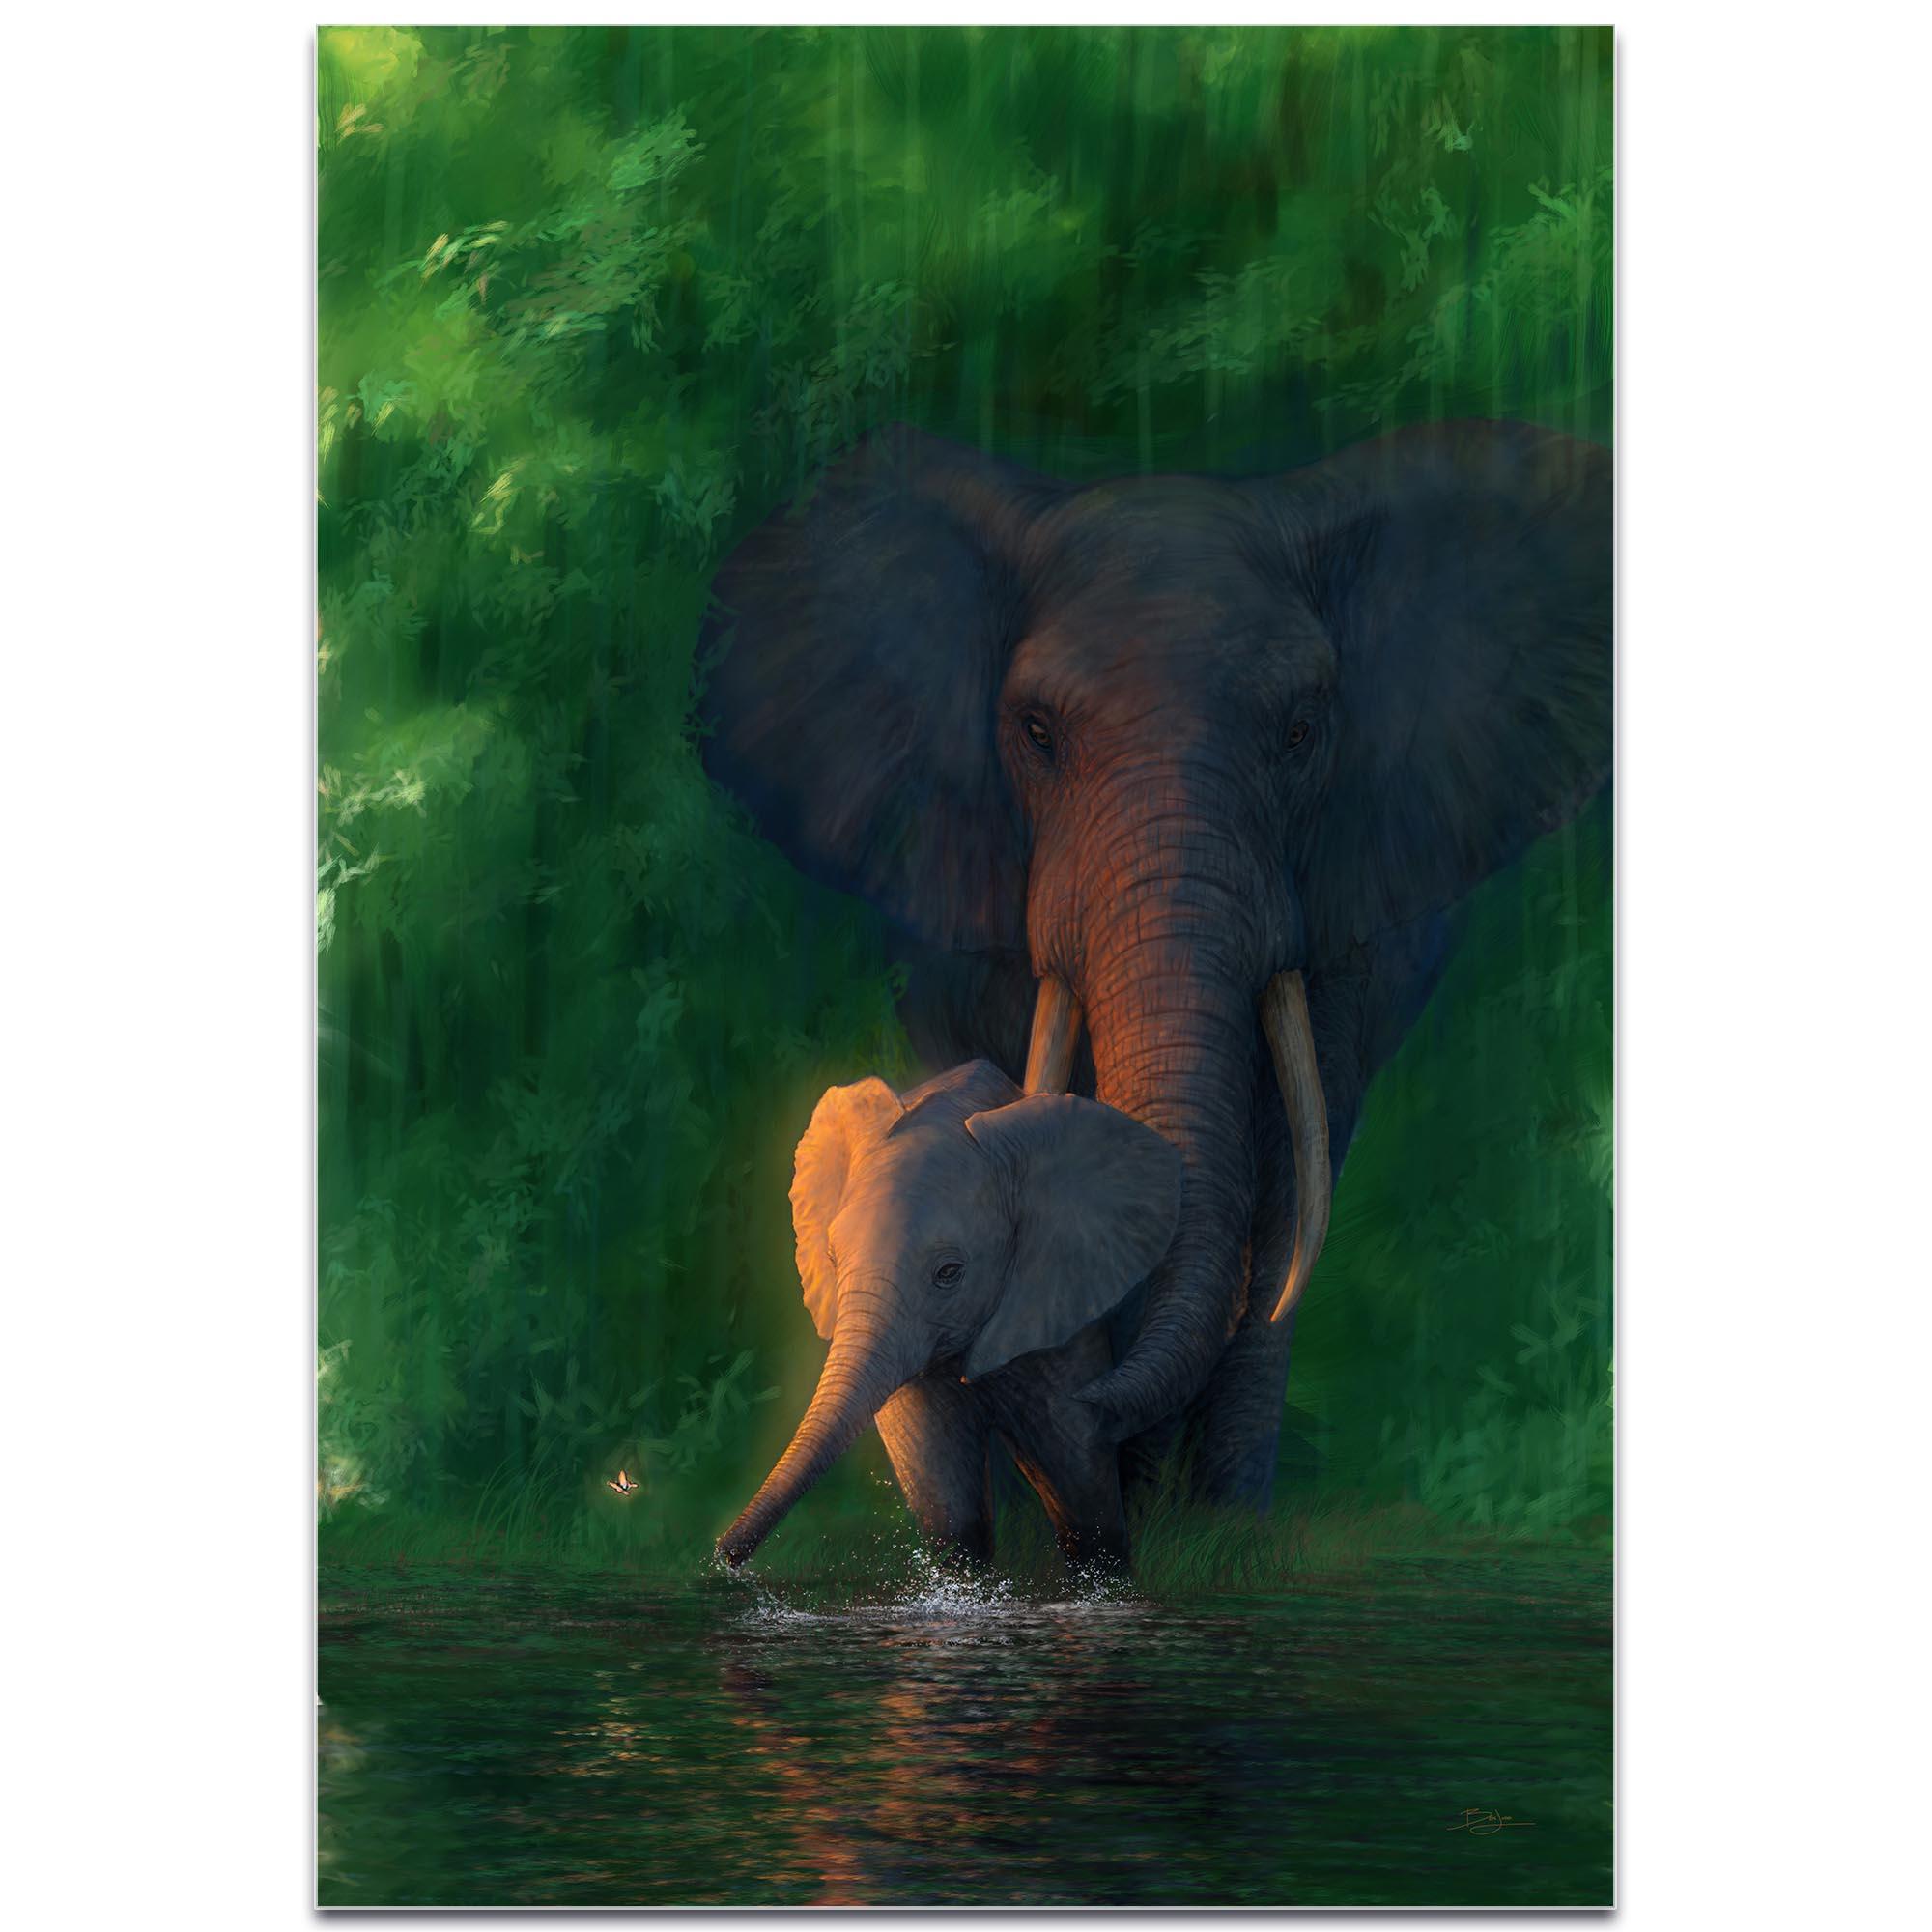 Elephant Wall Art 'Carefree Calf' - African Wildlife Decor on Metal or Acrylic - Image 2